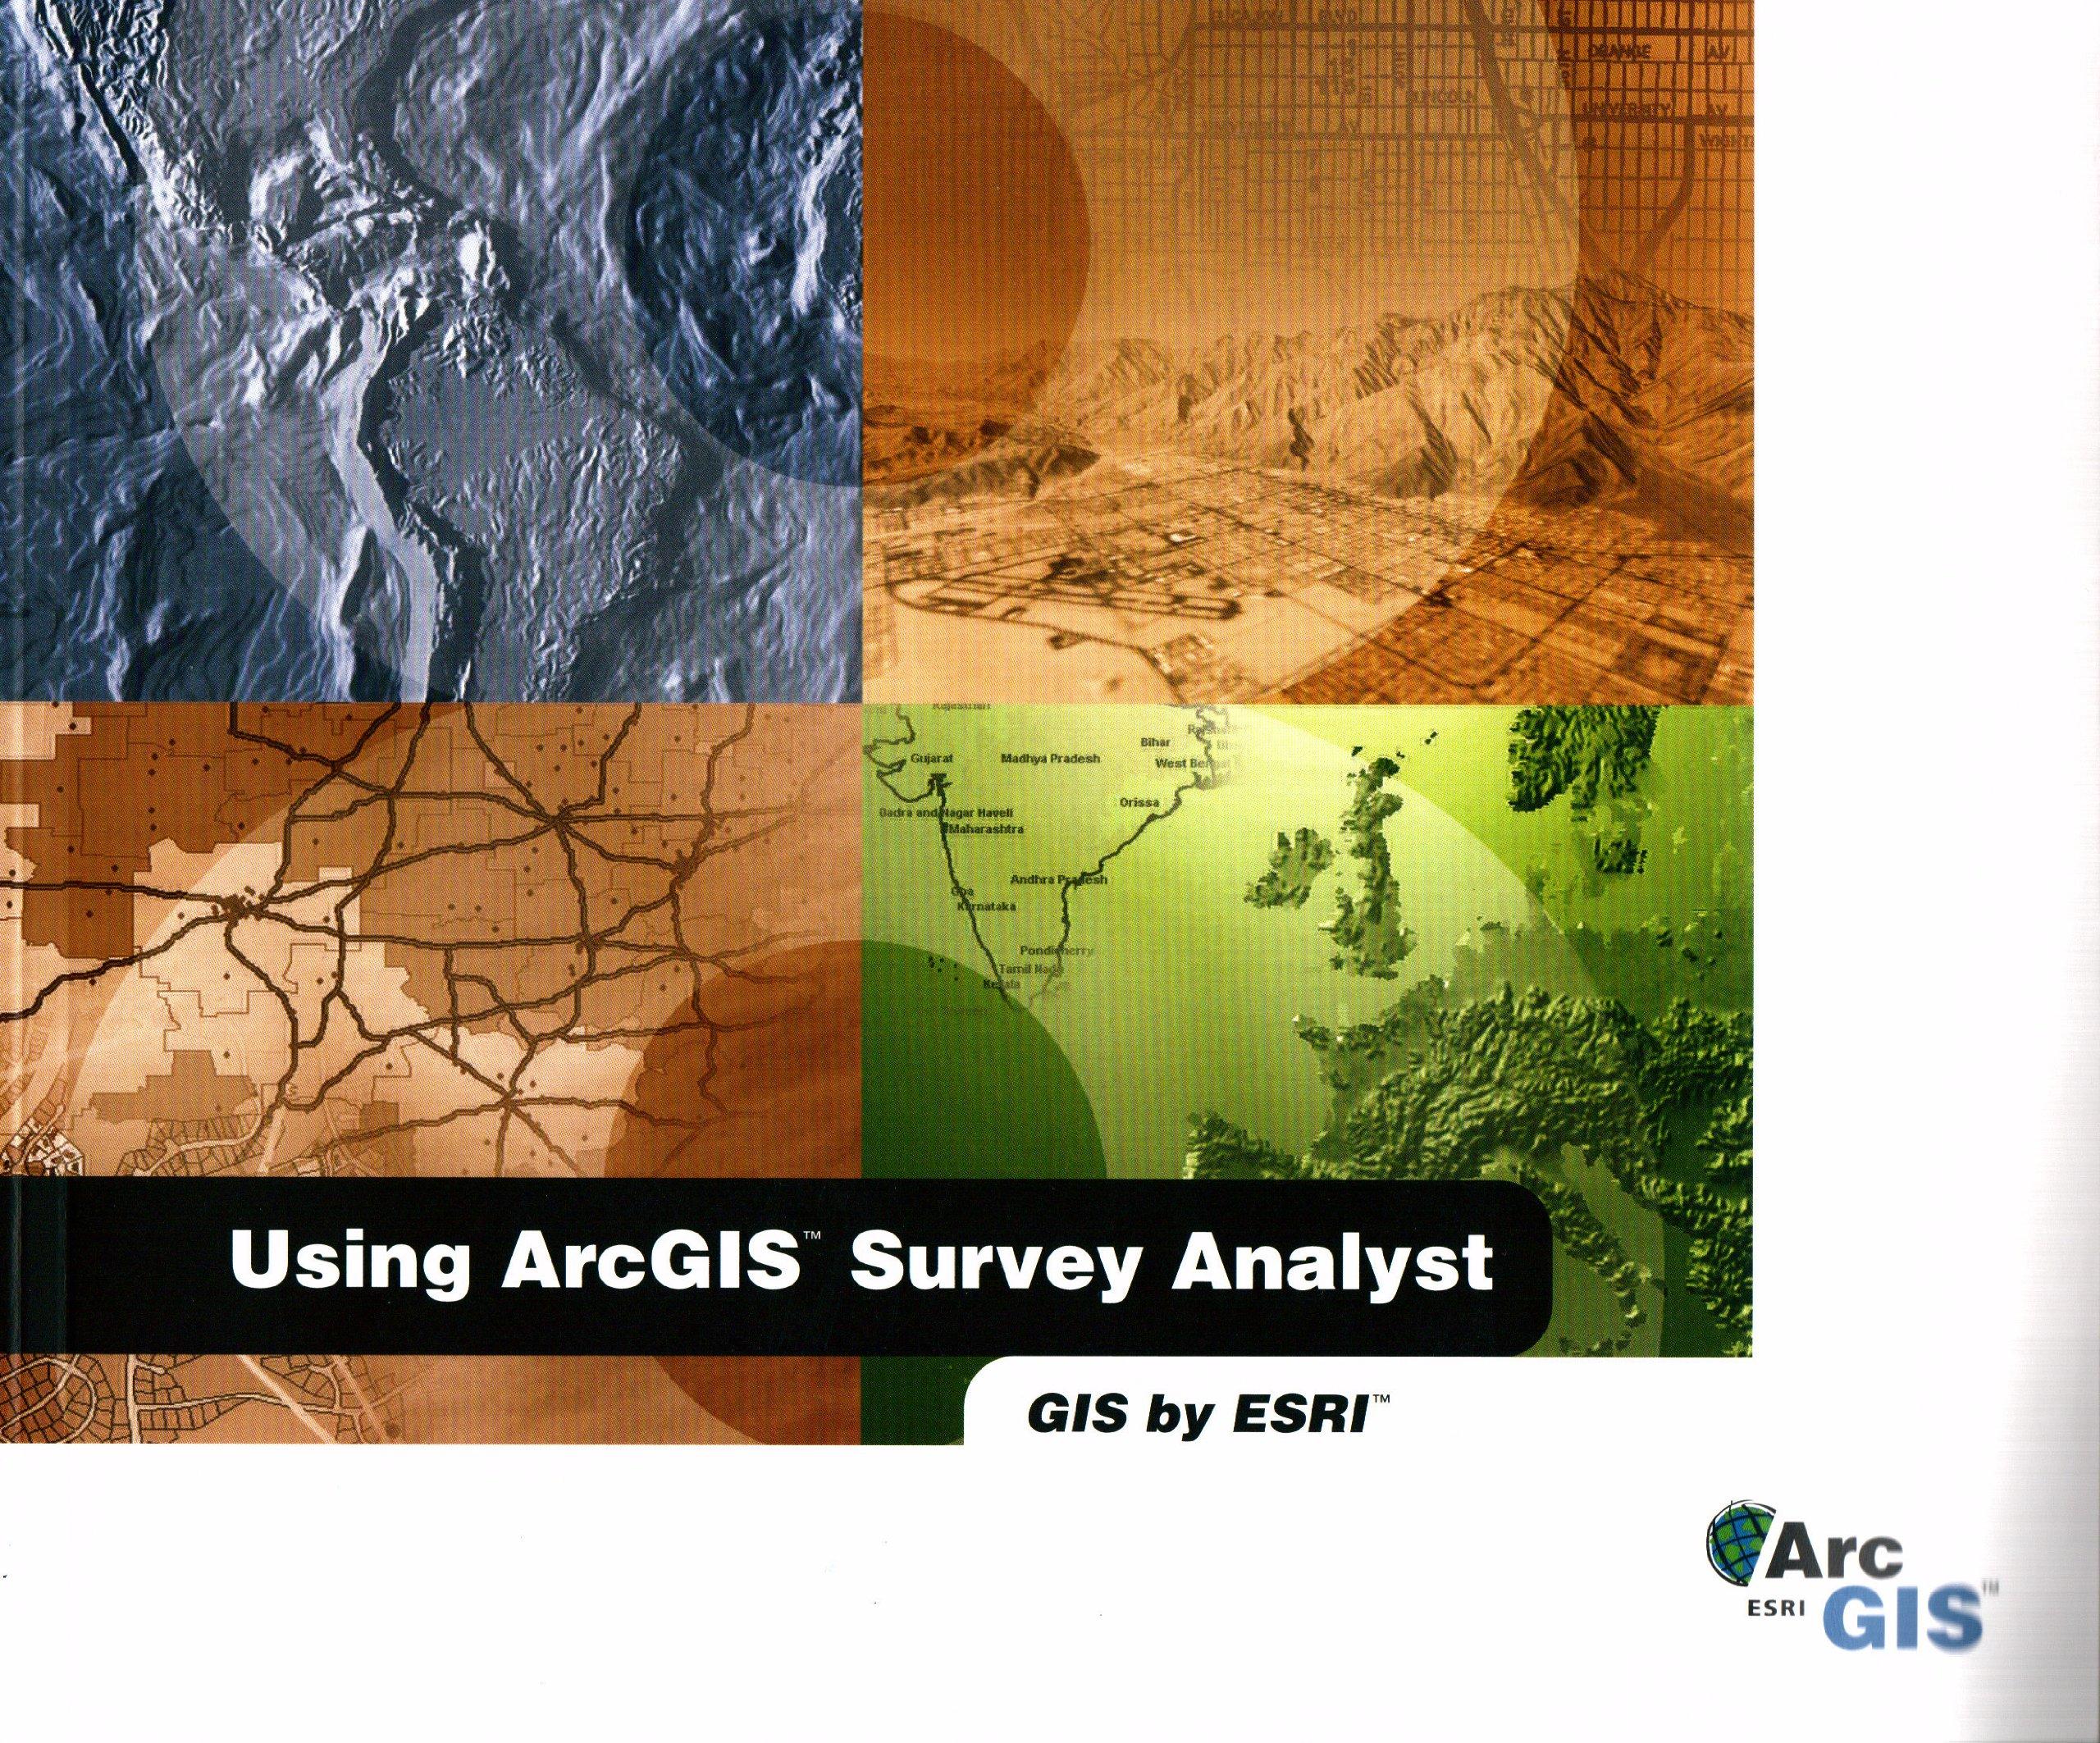 Download Using ArcGIS survey analyst: GIS by ESRI pdf